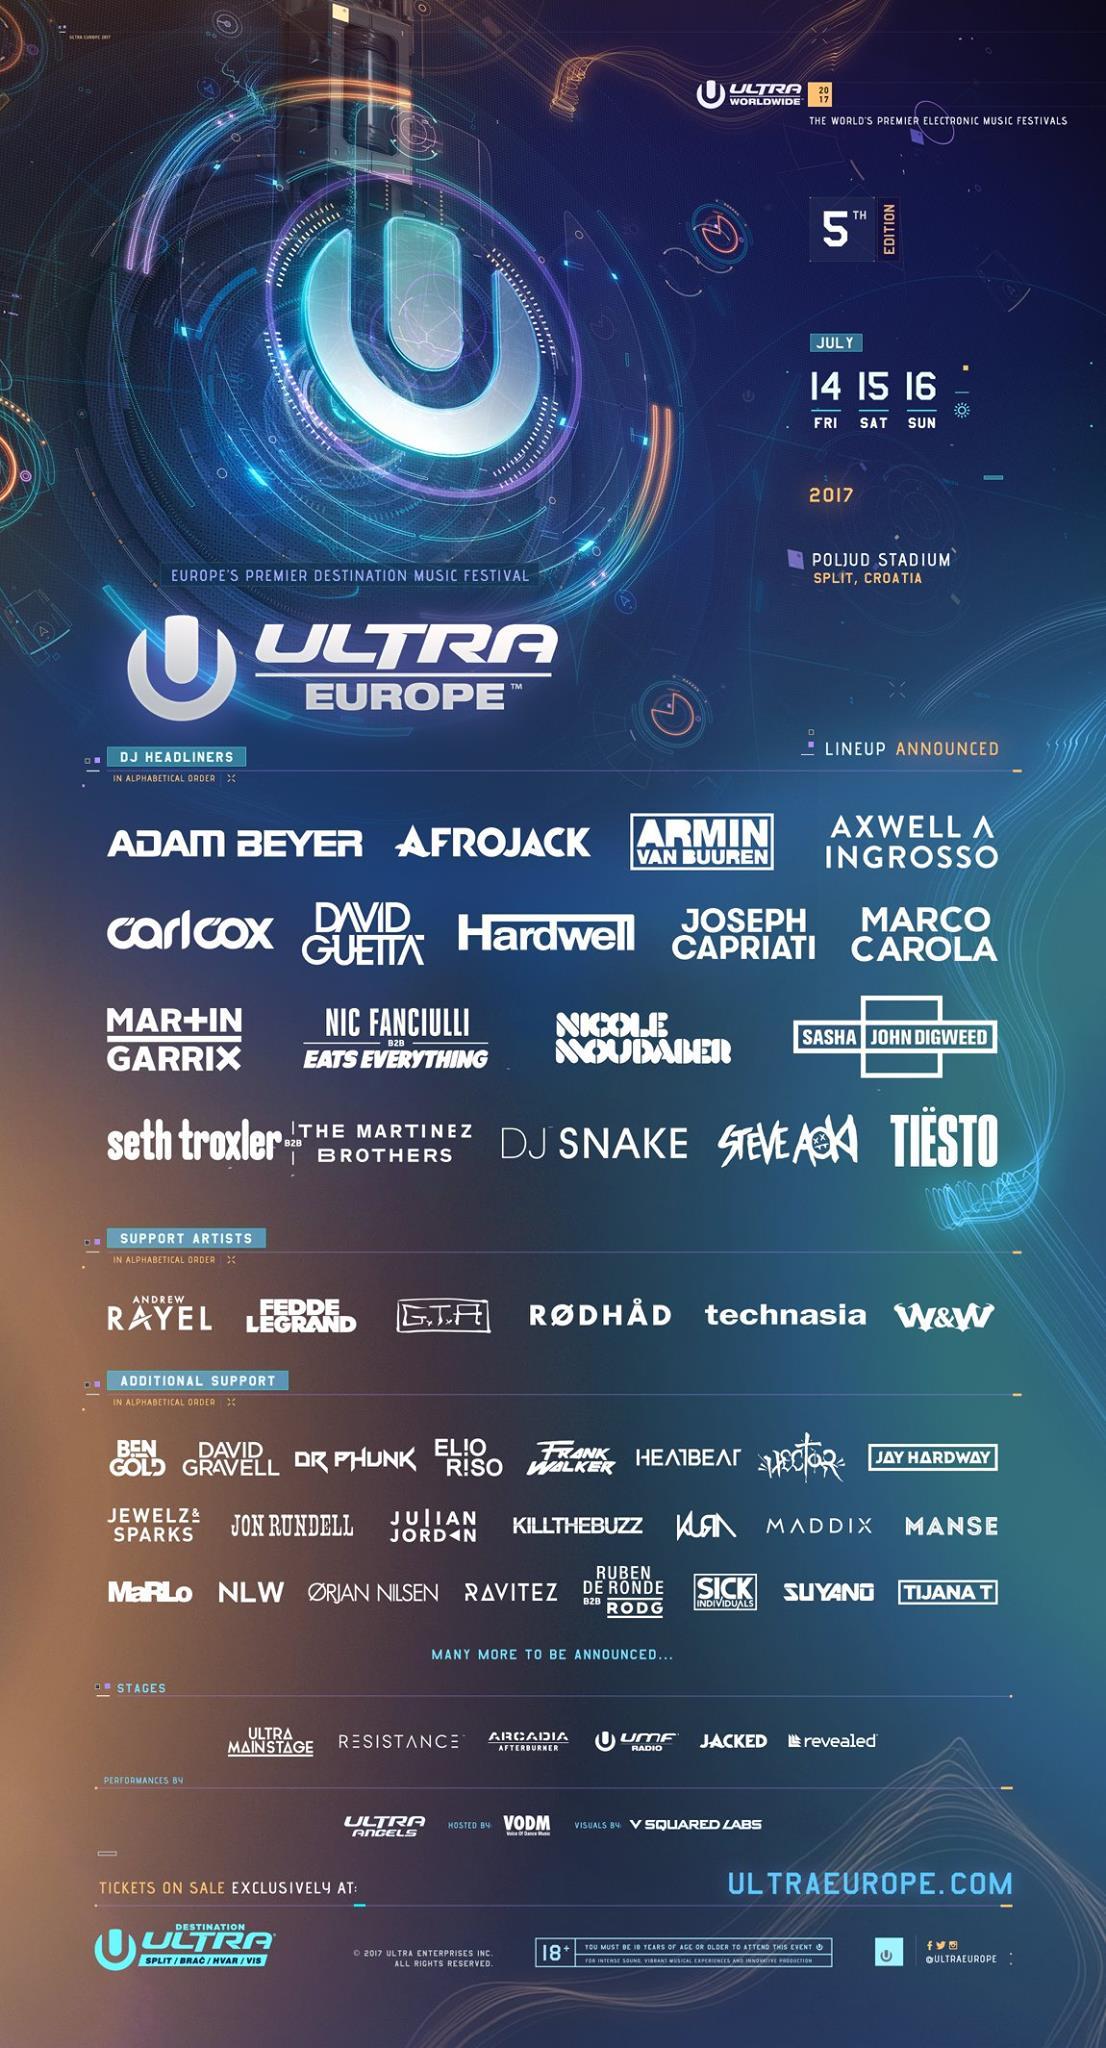 ultraeurope_lineup